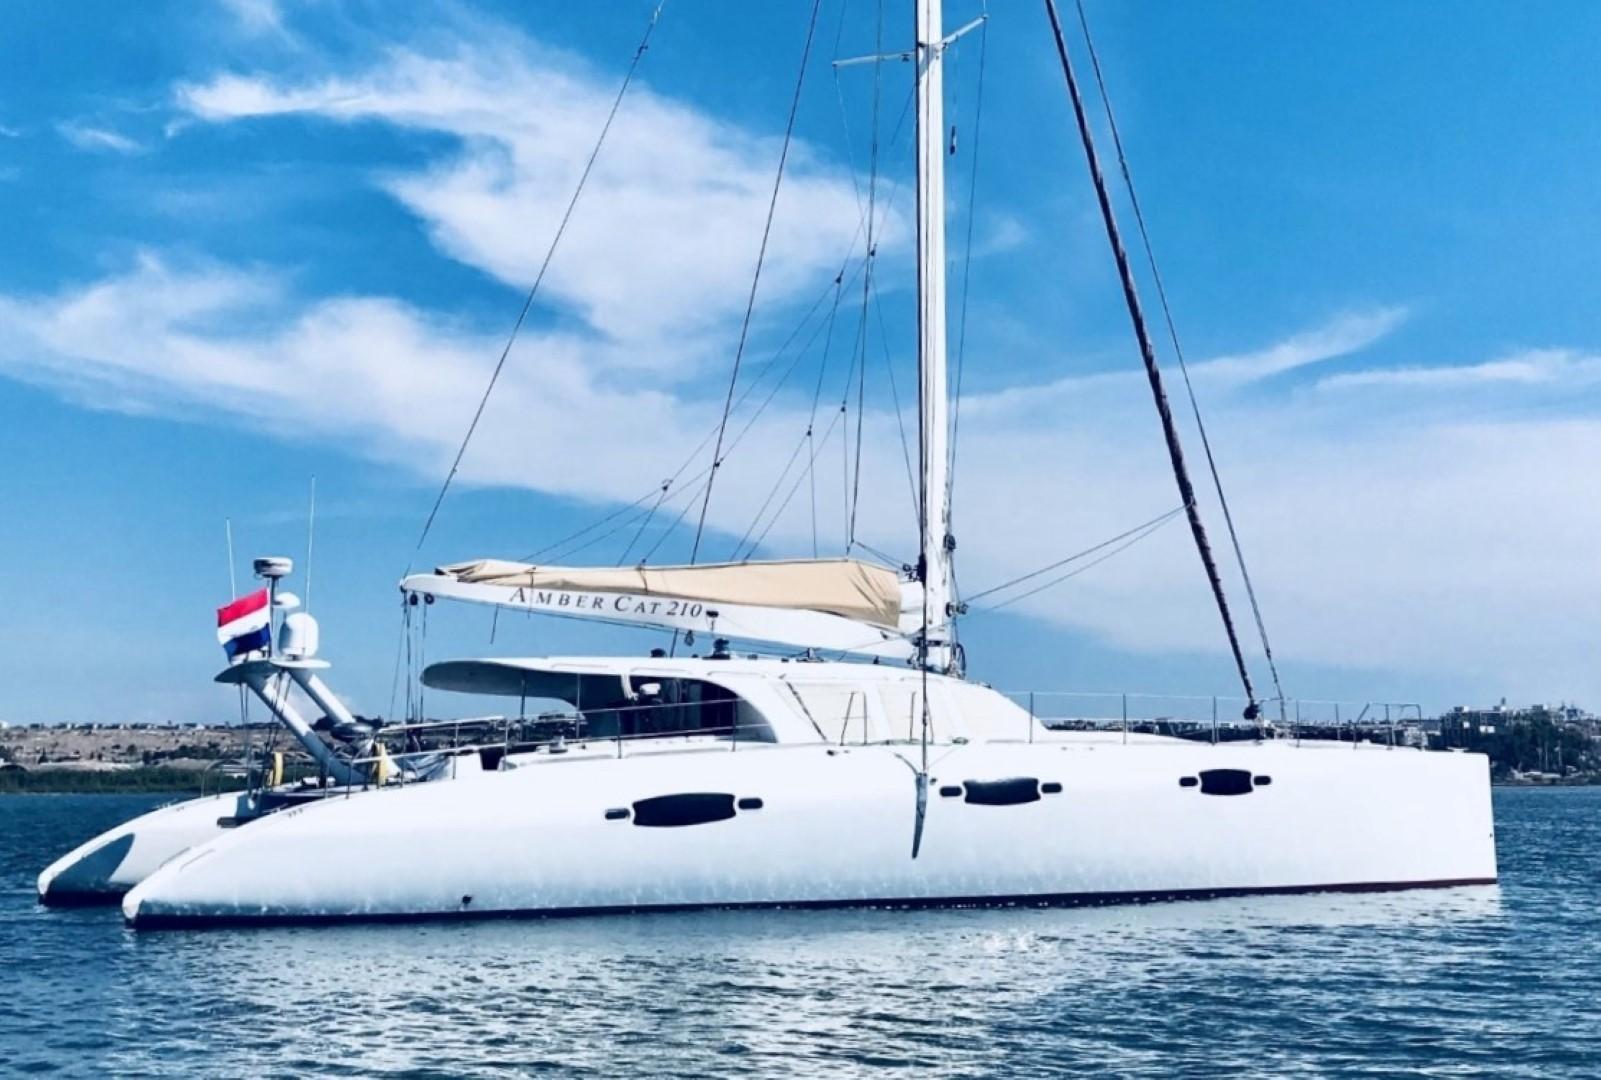 medium resolution of 2009 catamaran enmar ambercat 210